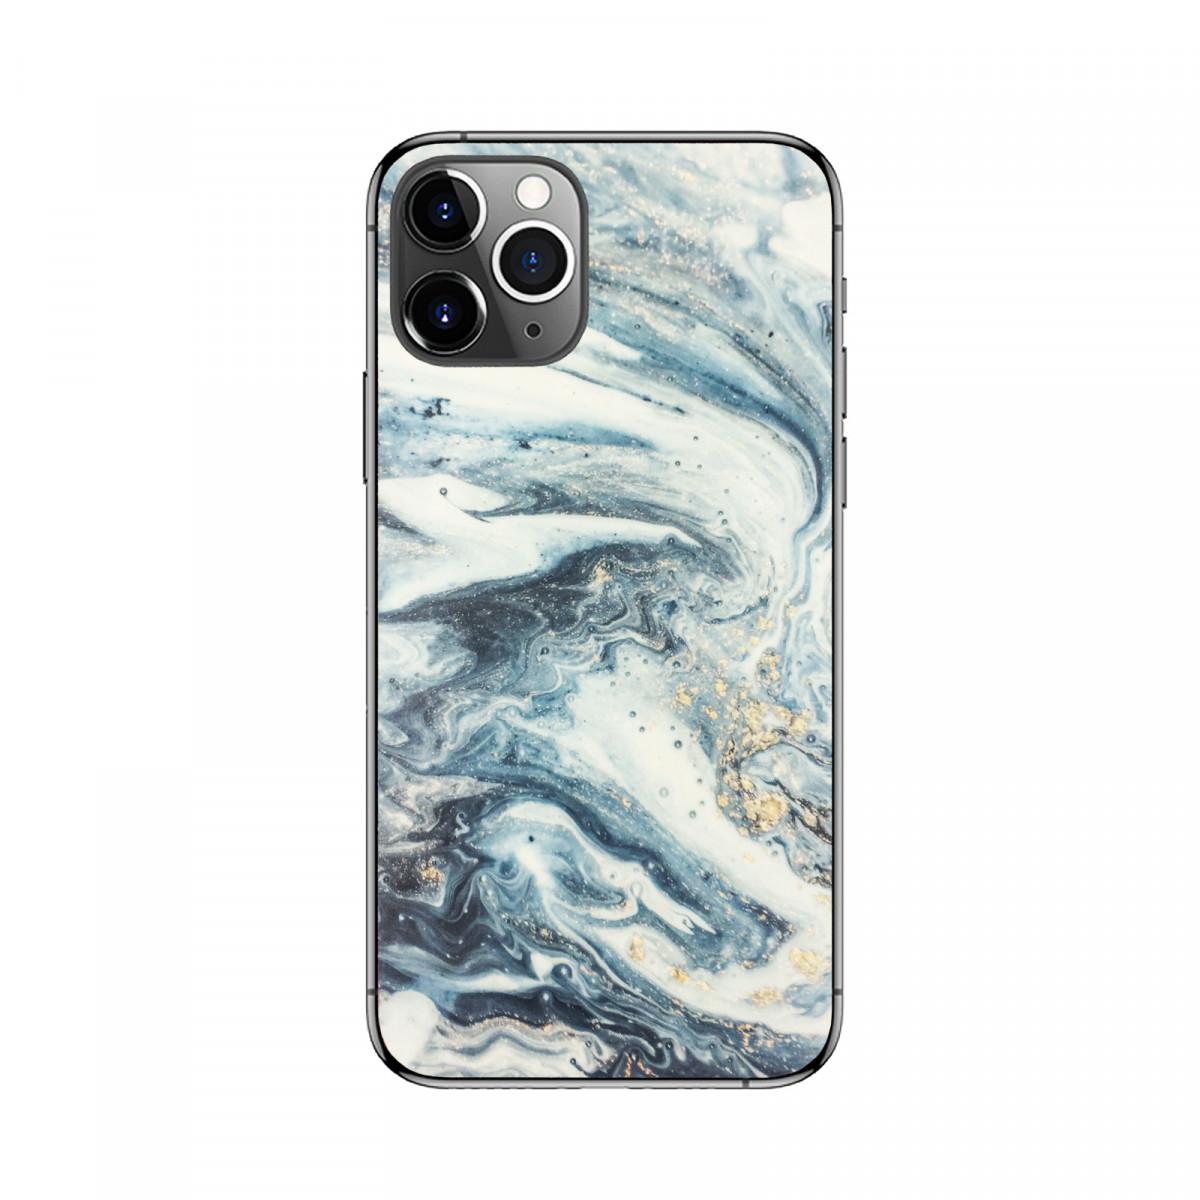 Захисна плівка чохол на смартфон Блакитний Мармур